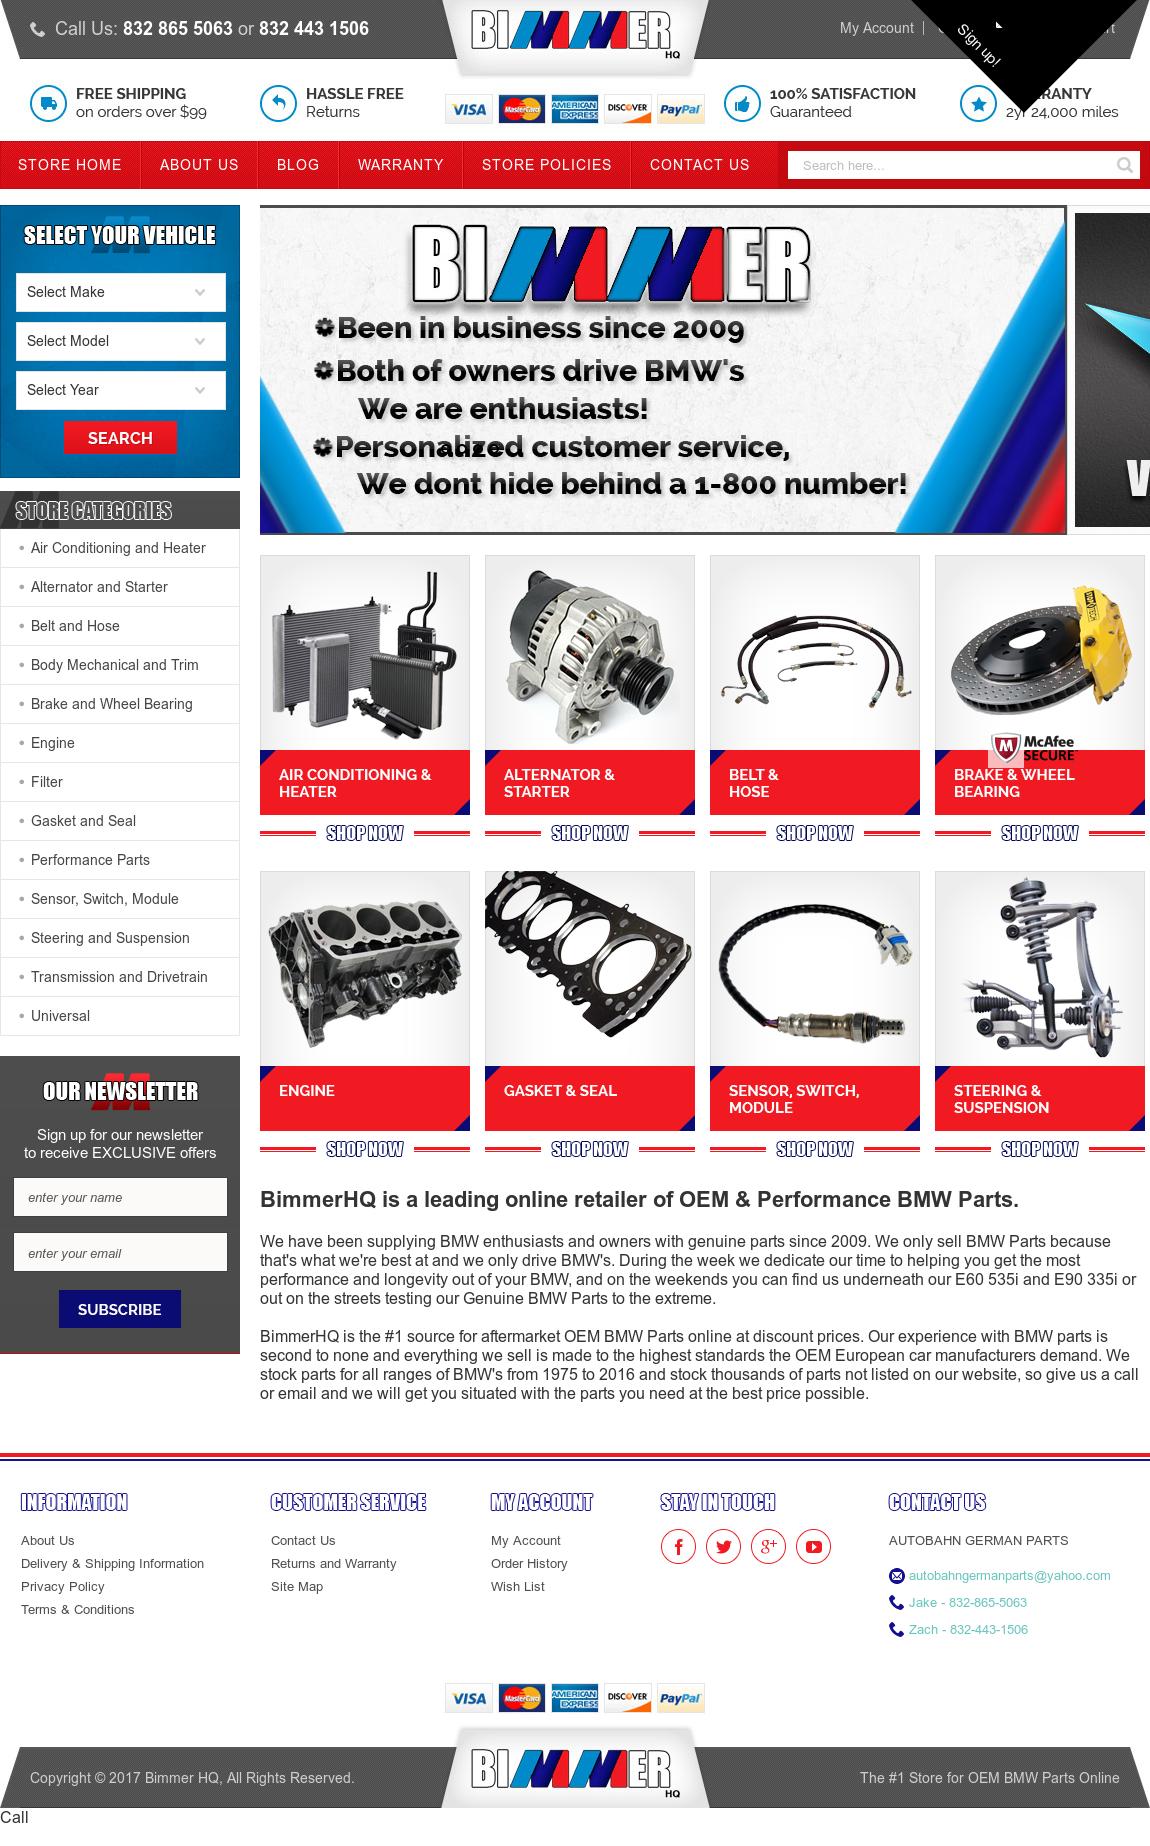 Owler Reports - Bimmerhq Blog BMW E46 Engine Tuning Guide